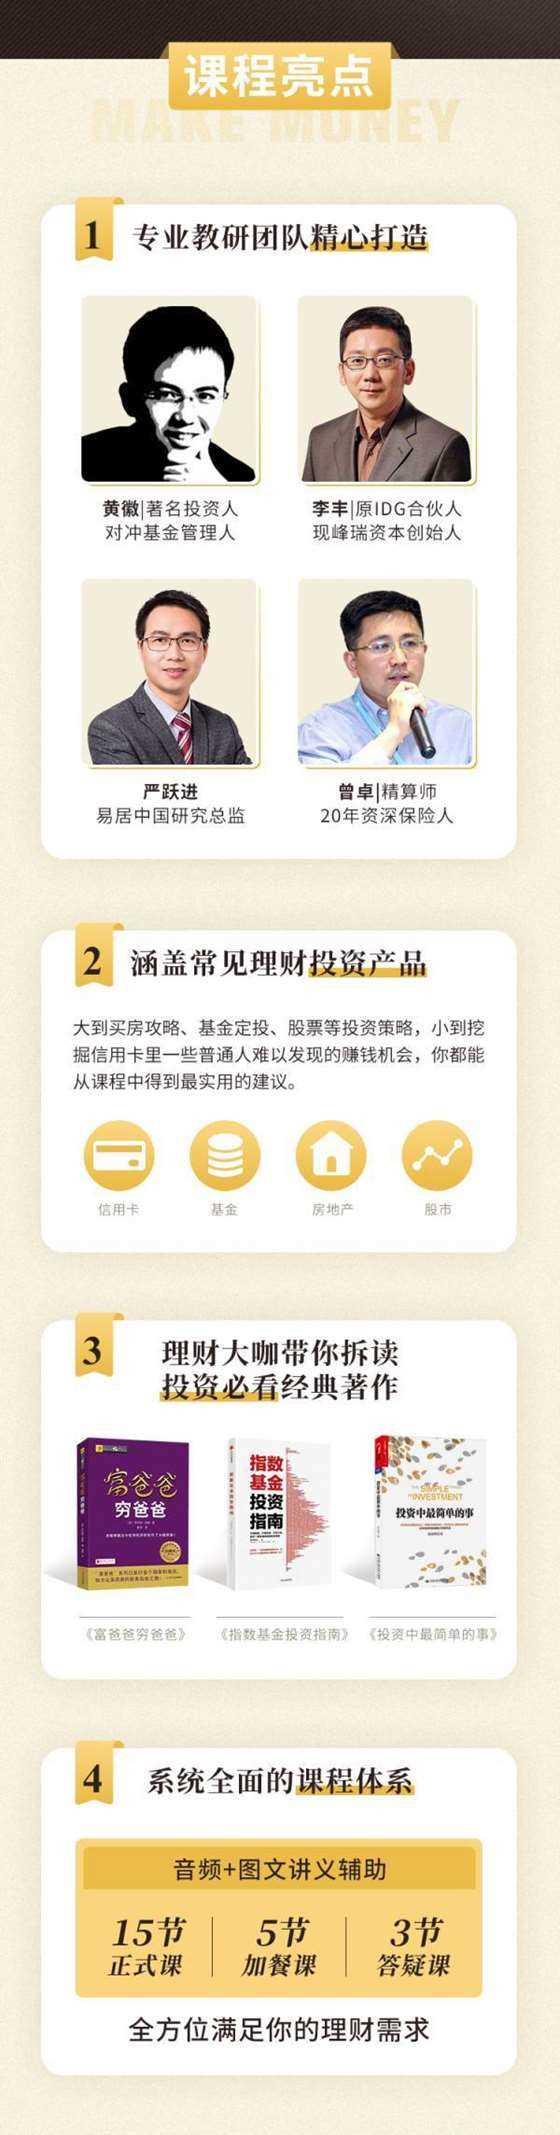 http://www.huodongxing.com/file/20160530/5092341960349/363141739776861.jpg